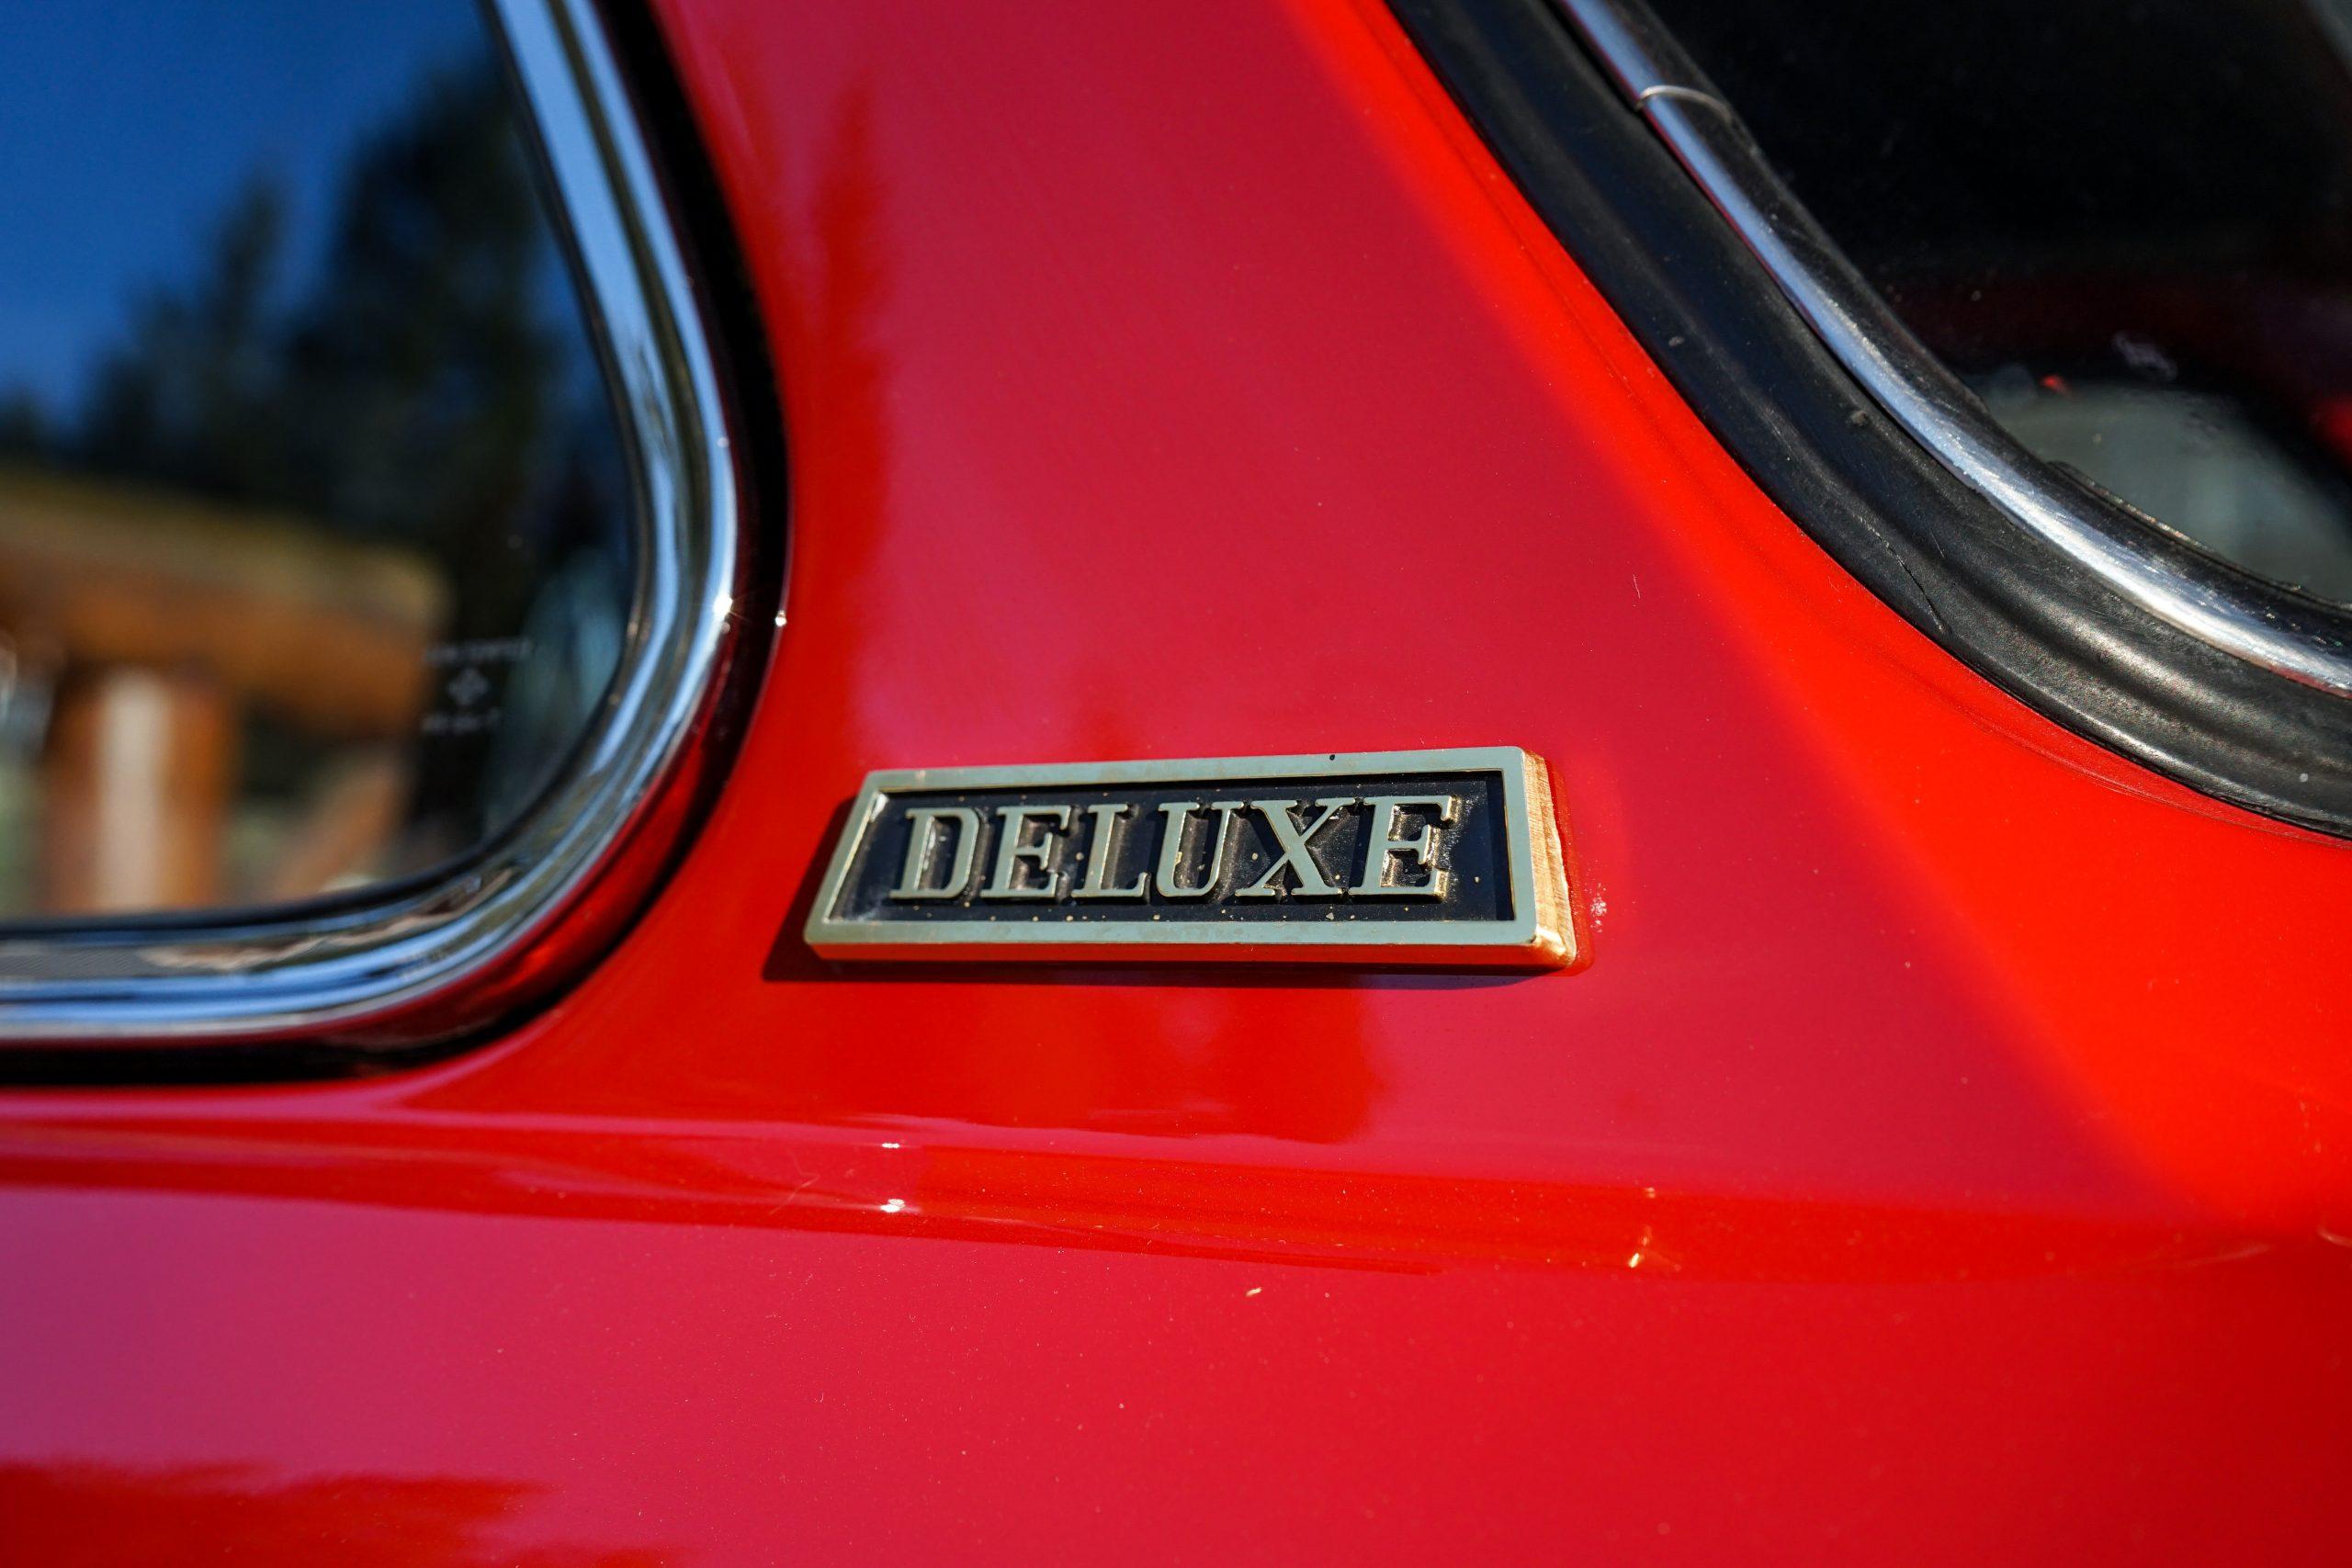 1966-Toyota-Publica-2-deluxe-logo